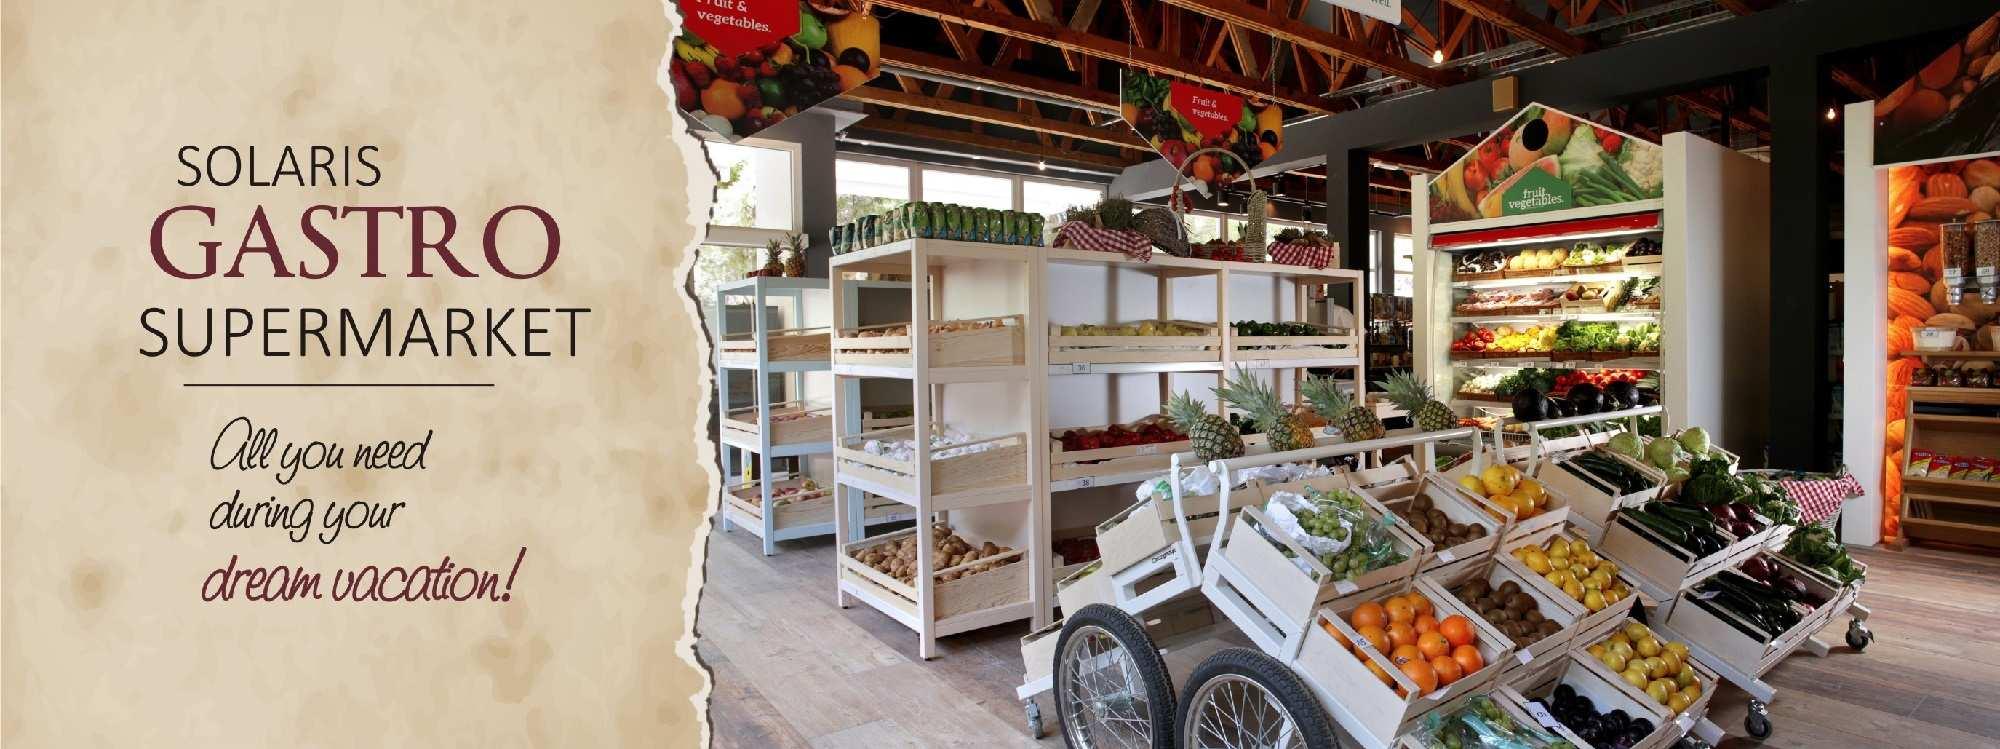 Solaris_gastro_supermarket_shoopping_croatia_vacation